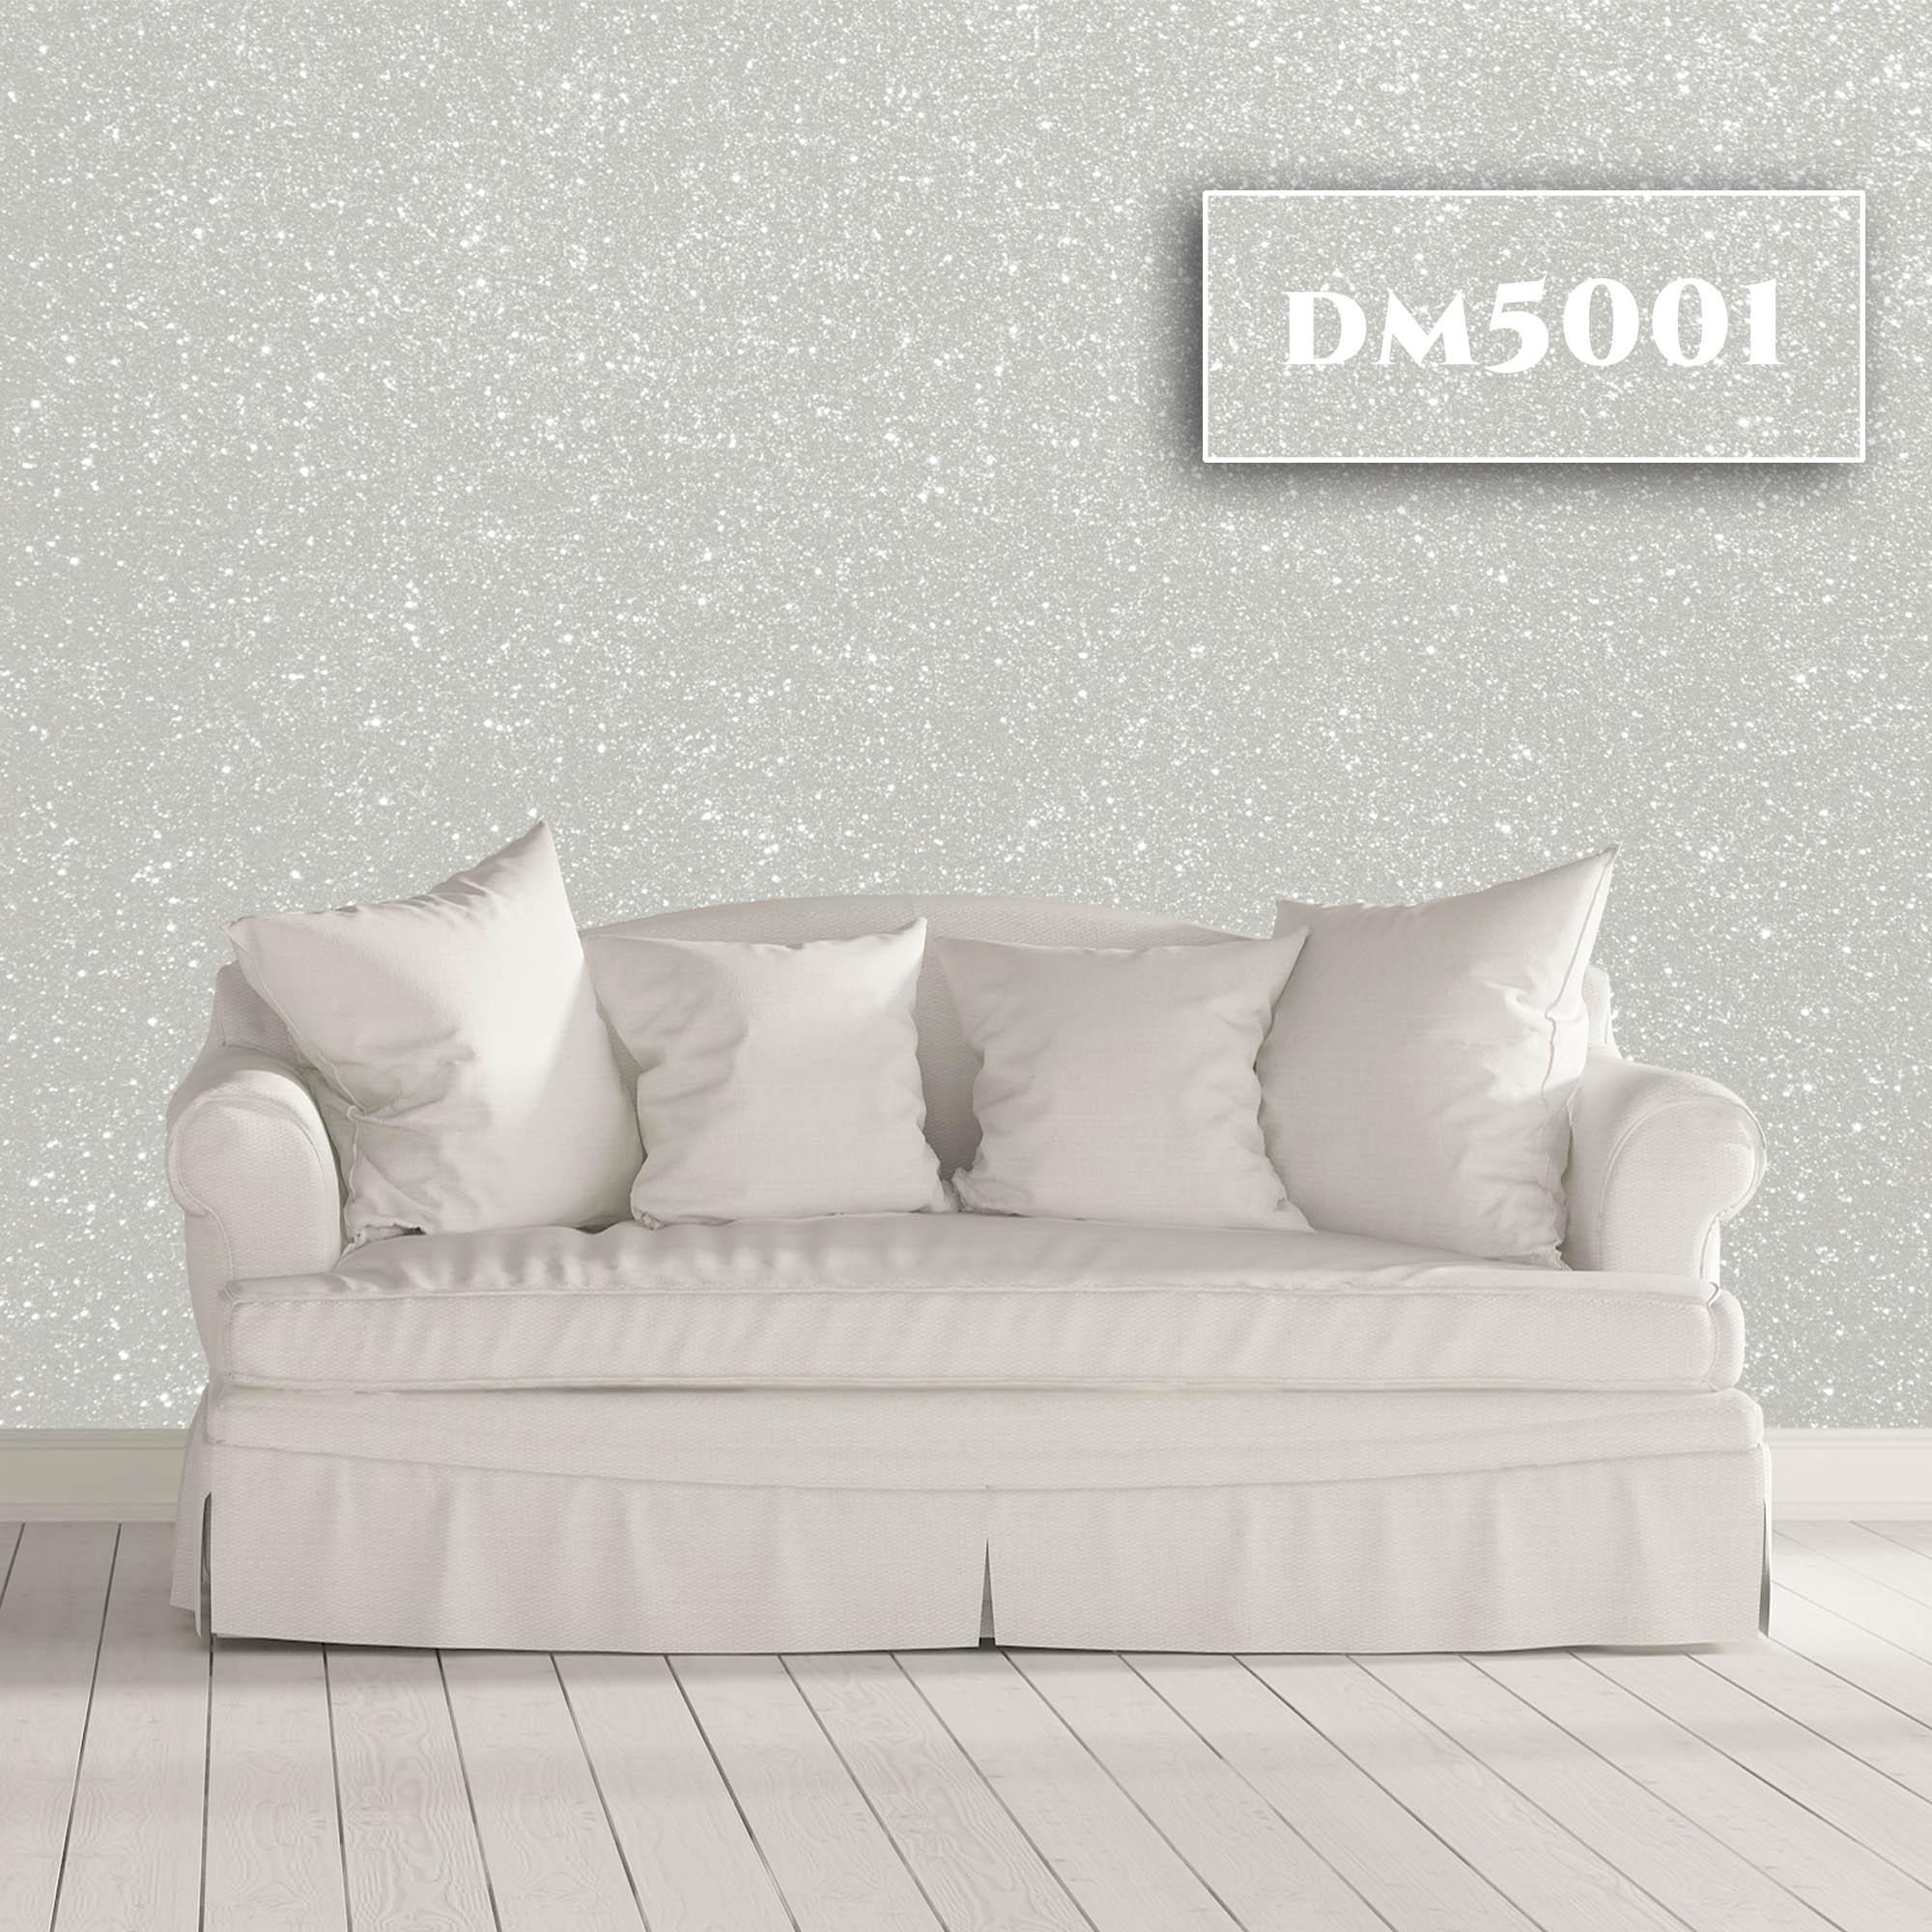 DM5001